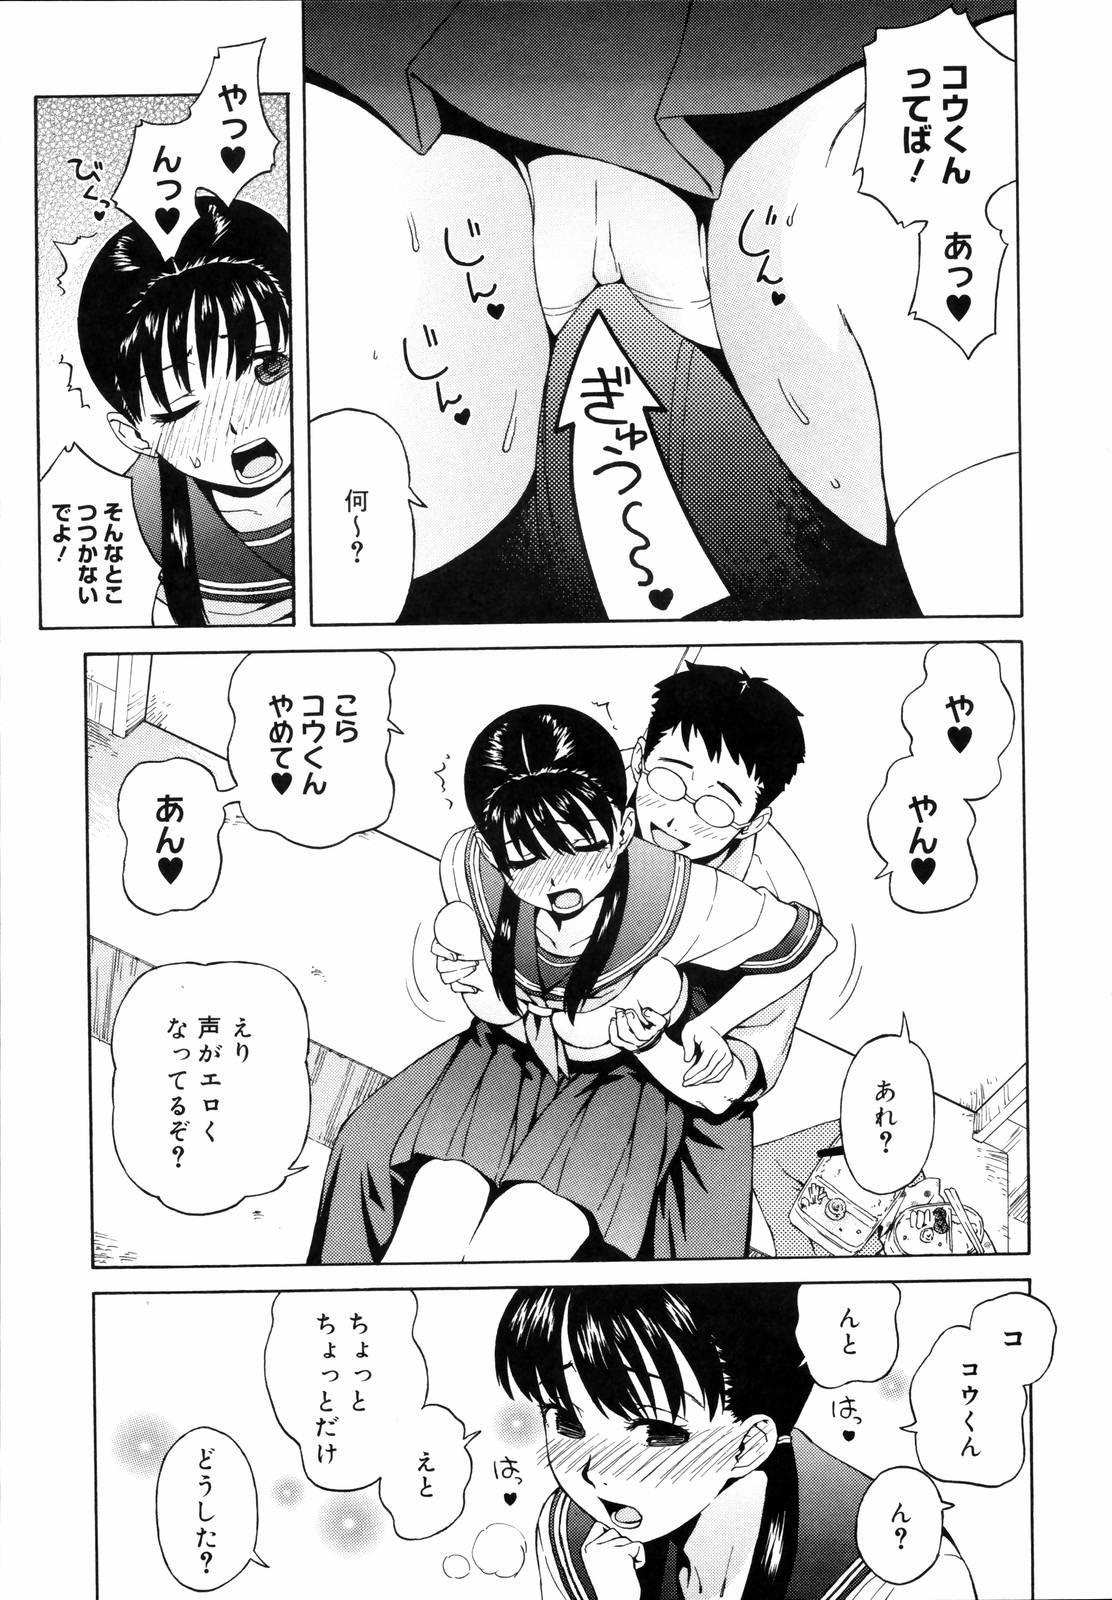 Shishunki wa Hatsujouki - Adolescence is a sexual excitement period. 76